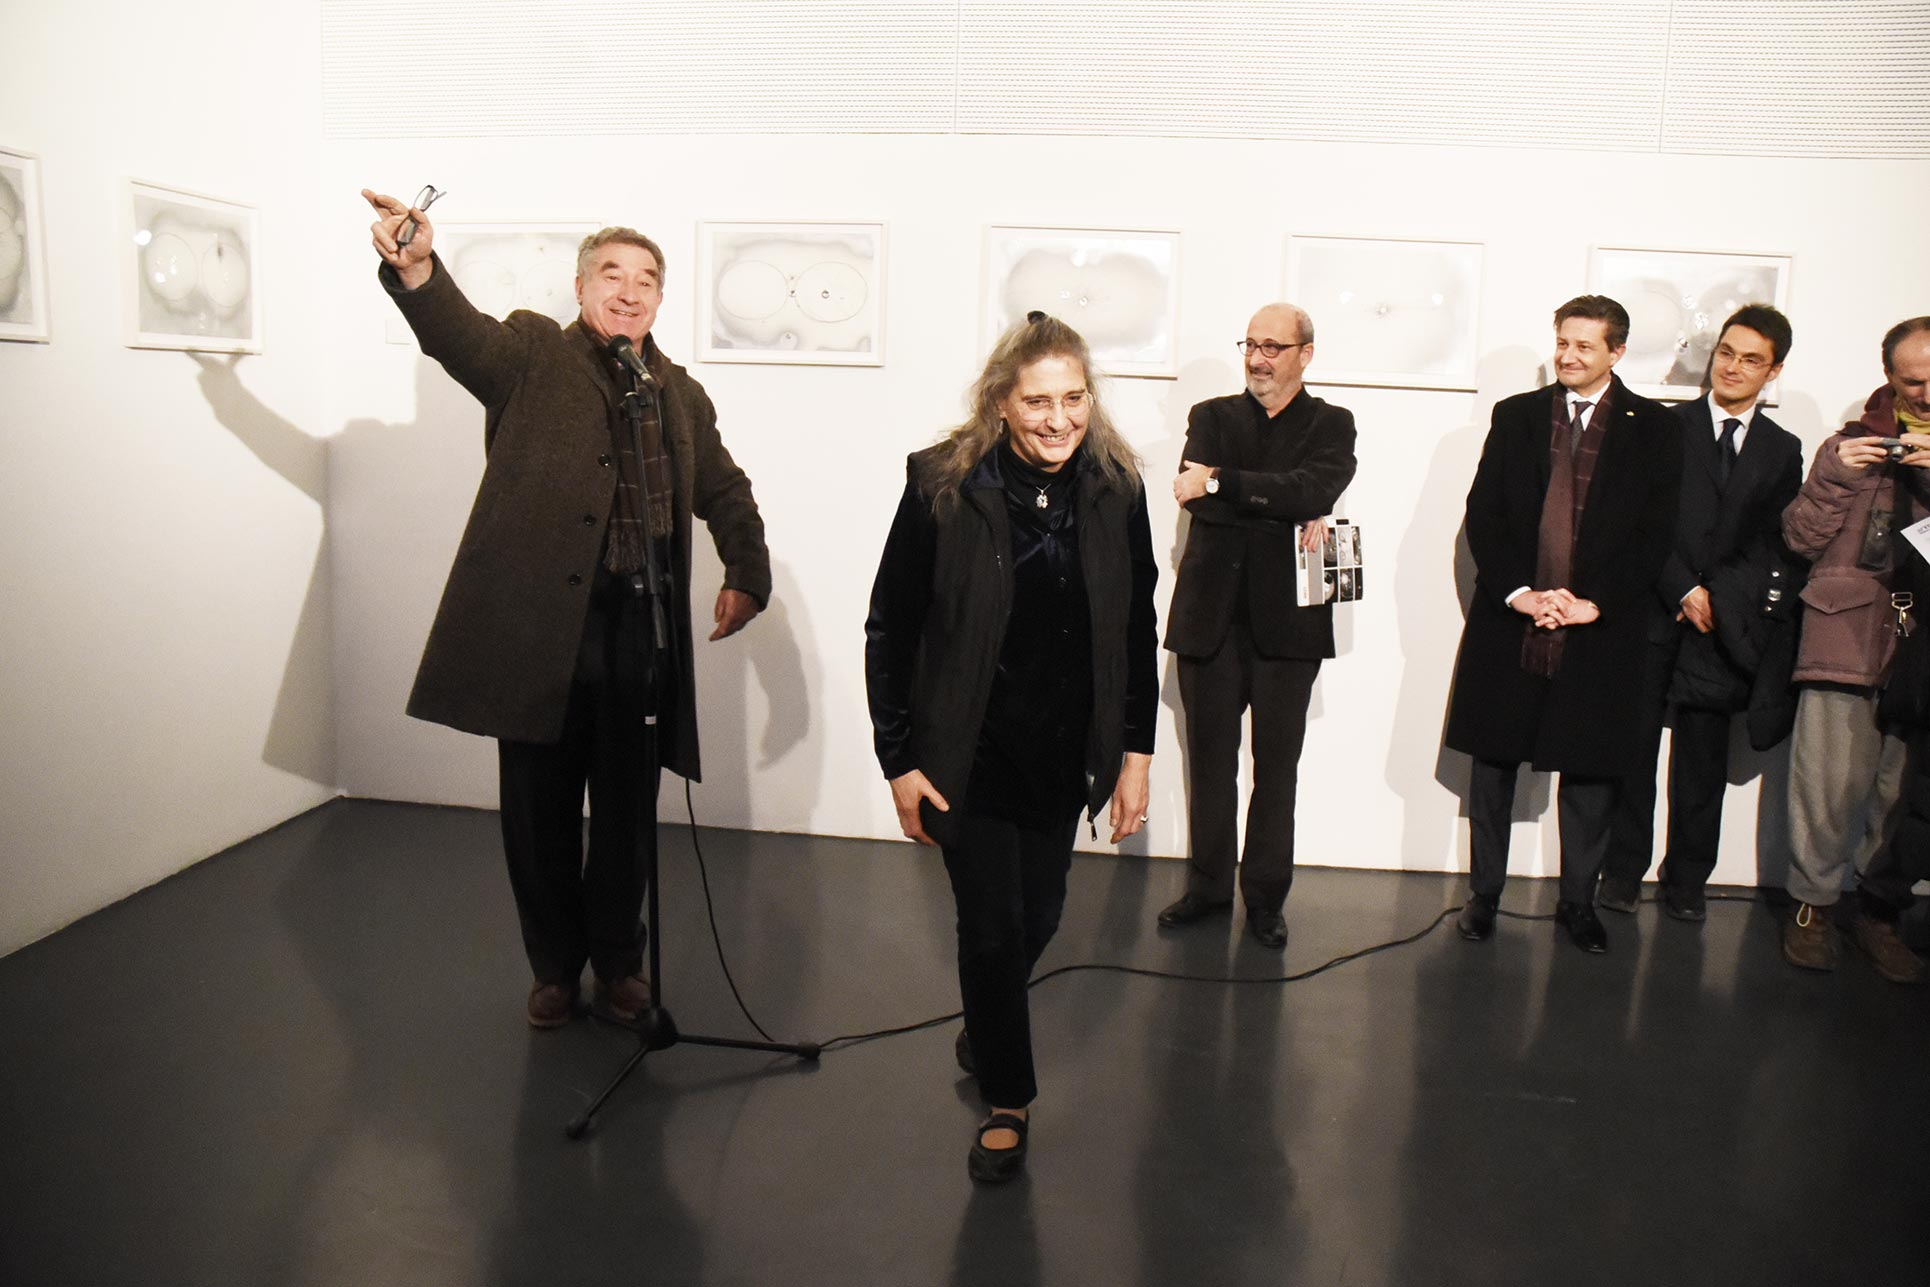 Guido Magnaguagno, Penelope M. Mackworth-Praed, Domenico Lucchini (Photo: Anna Pfeiffer)